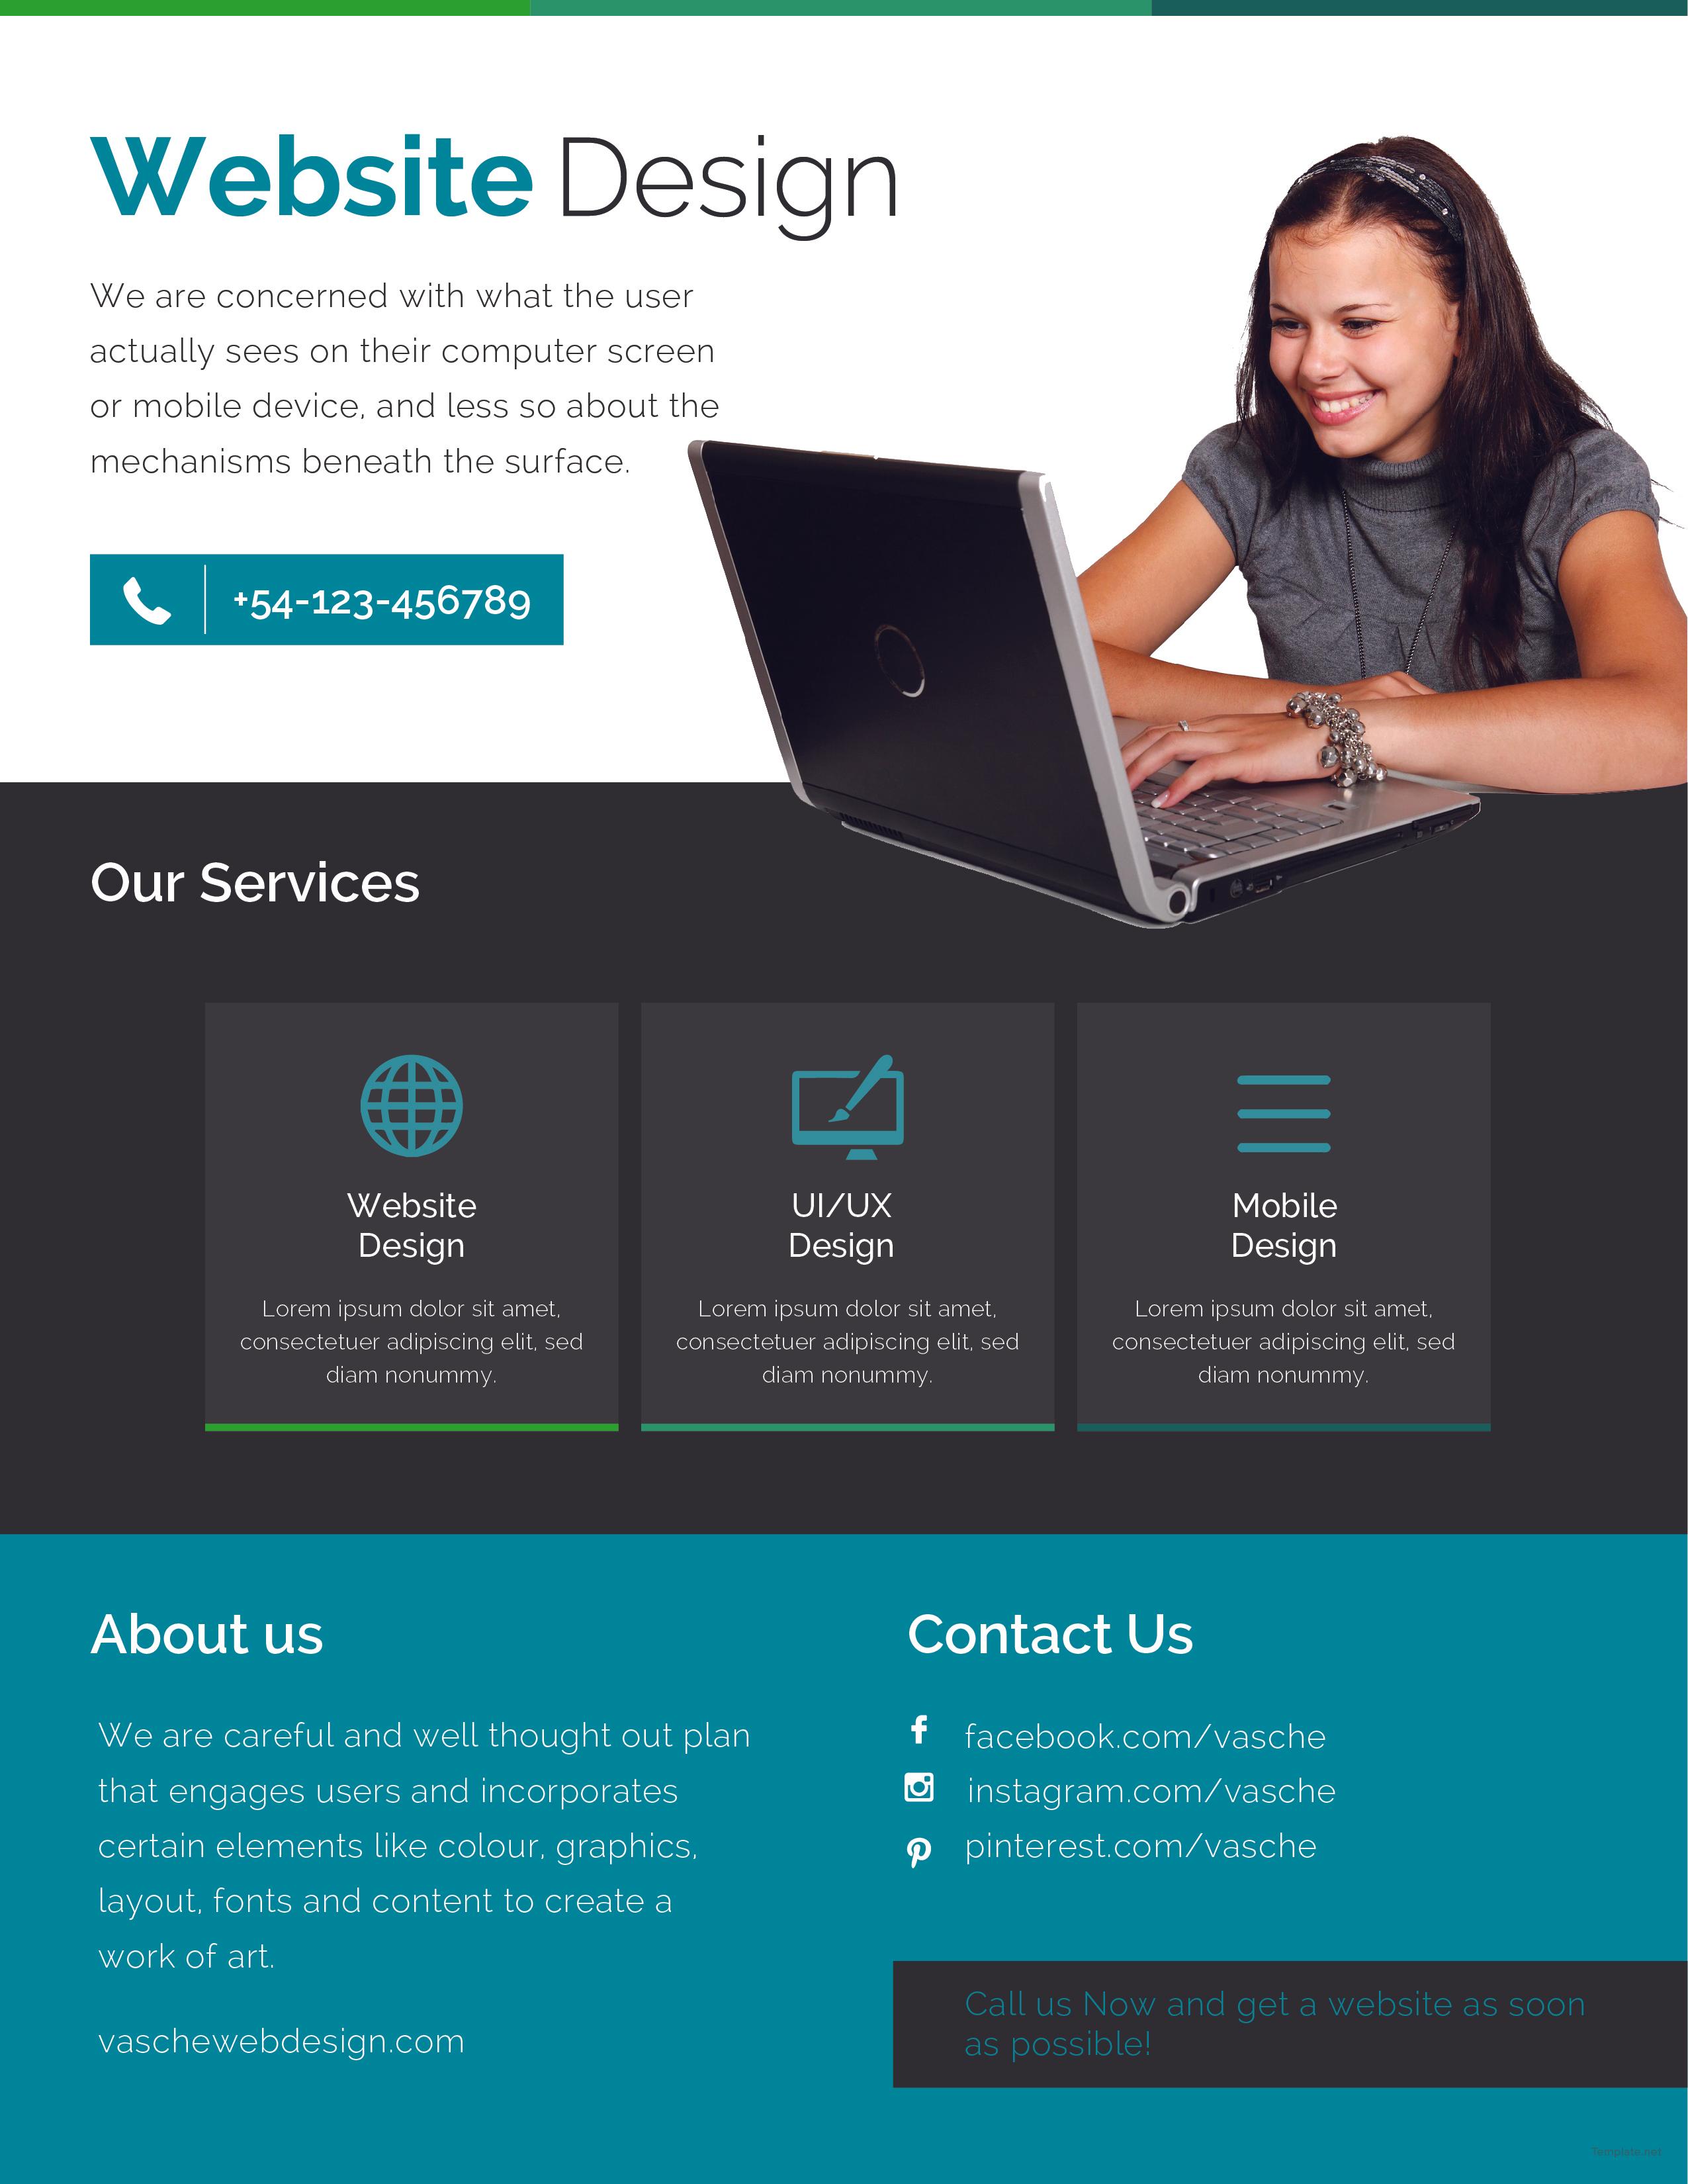 Free Website Design Flyer Template In Adobe Photoshop